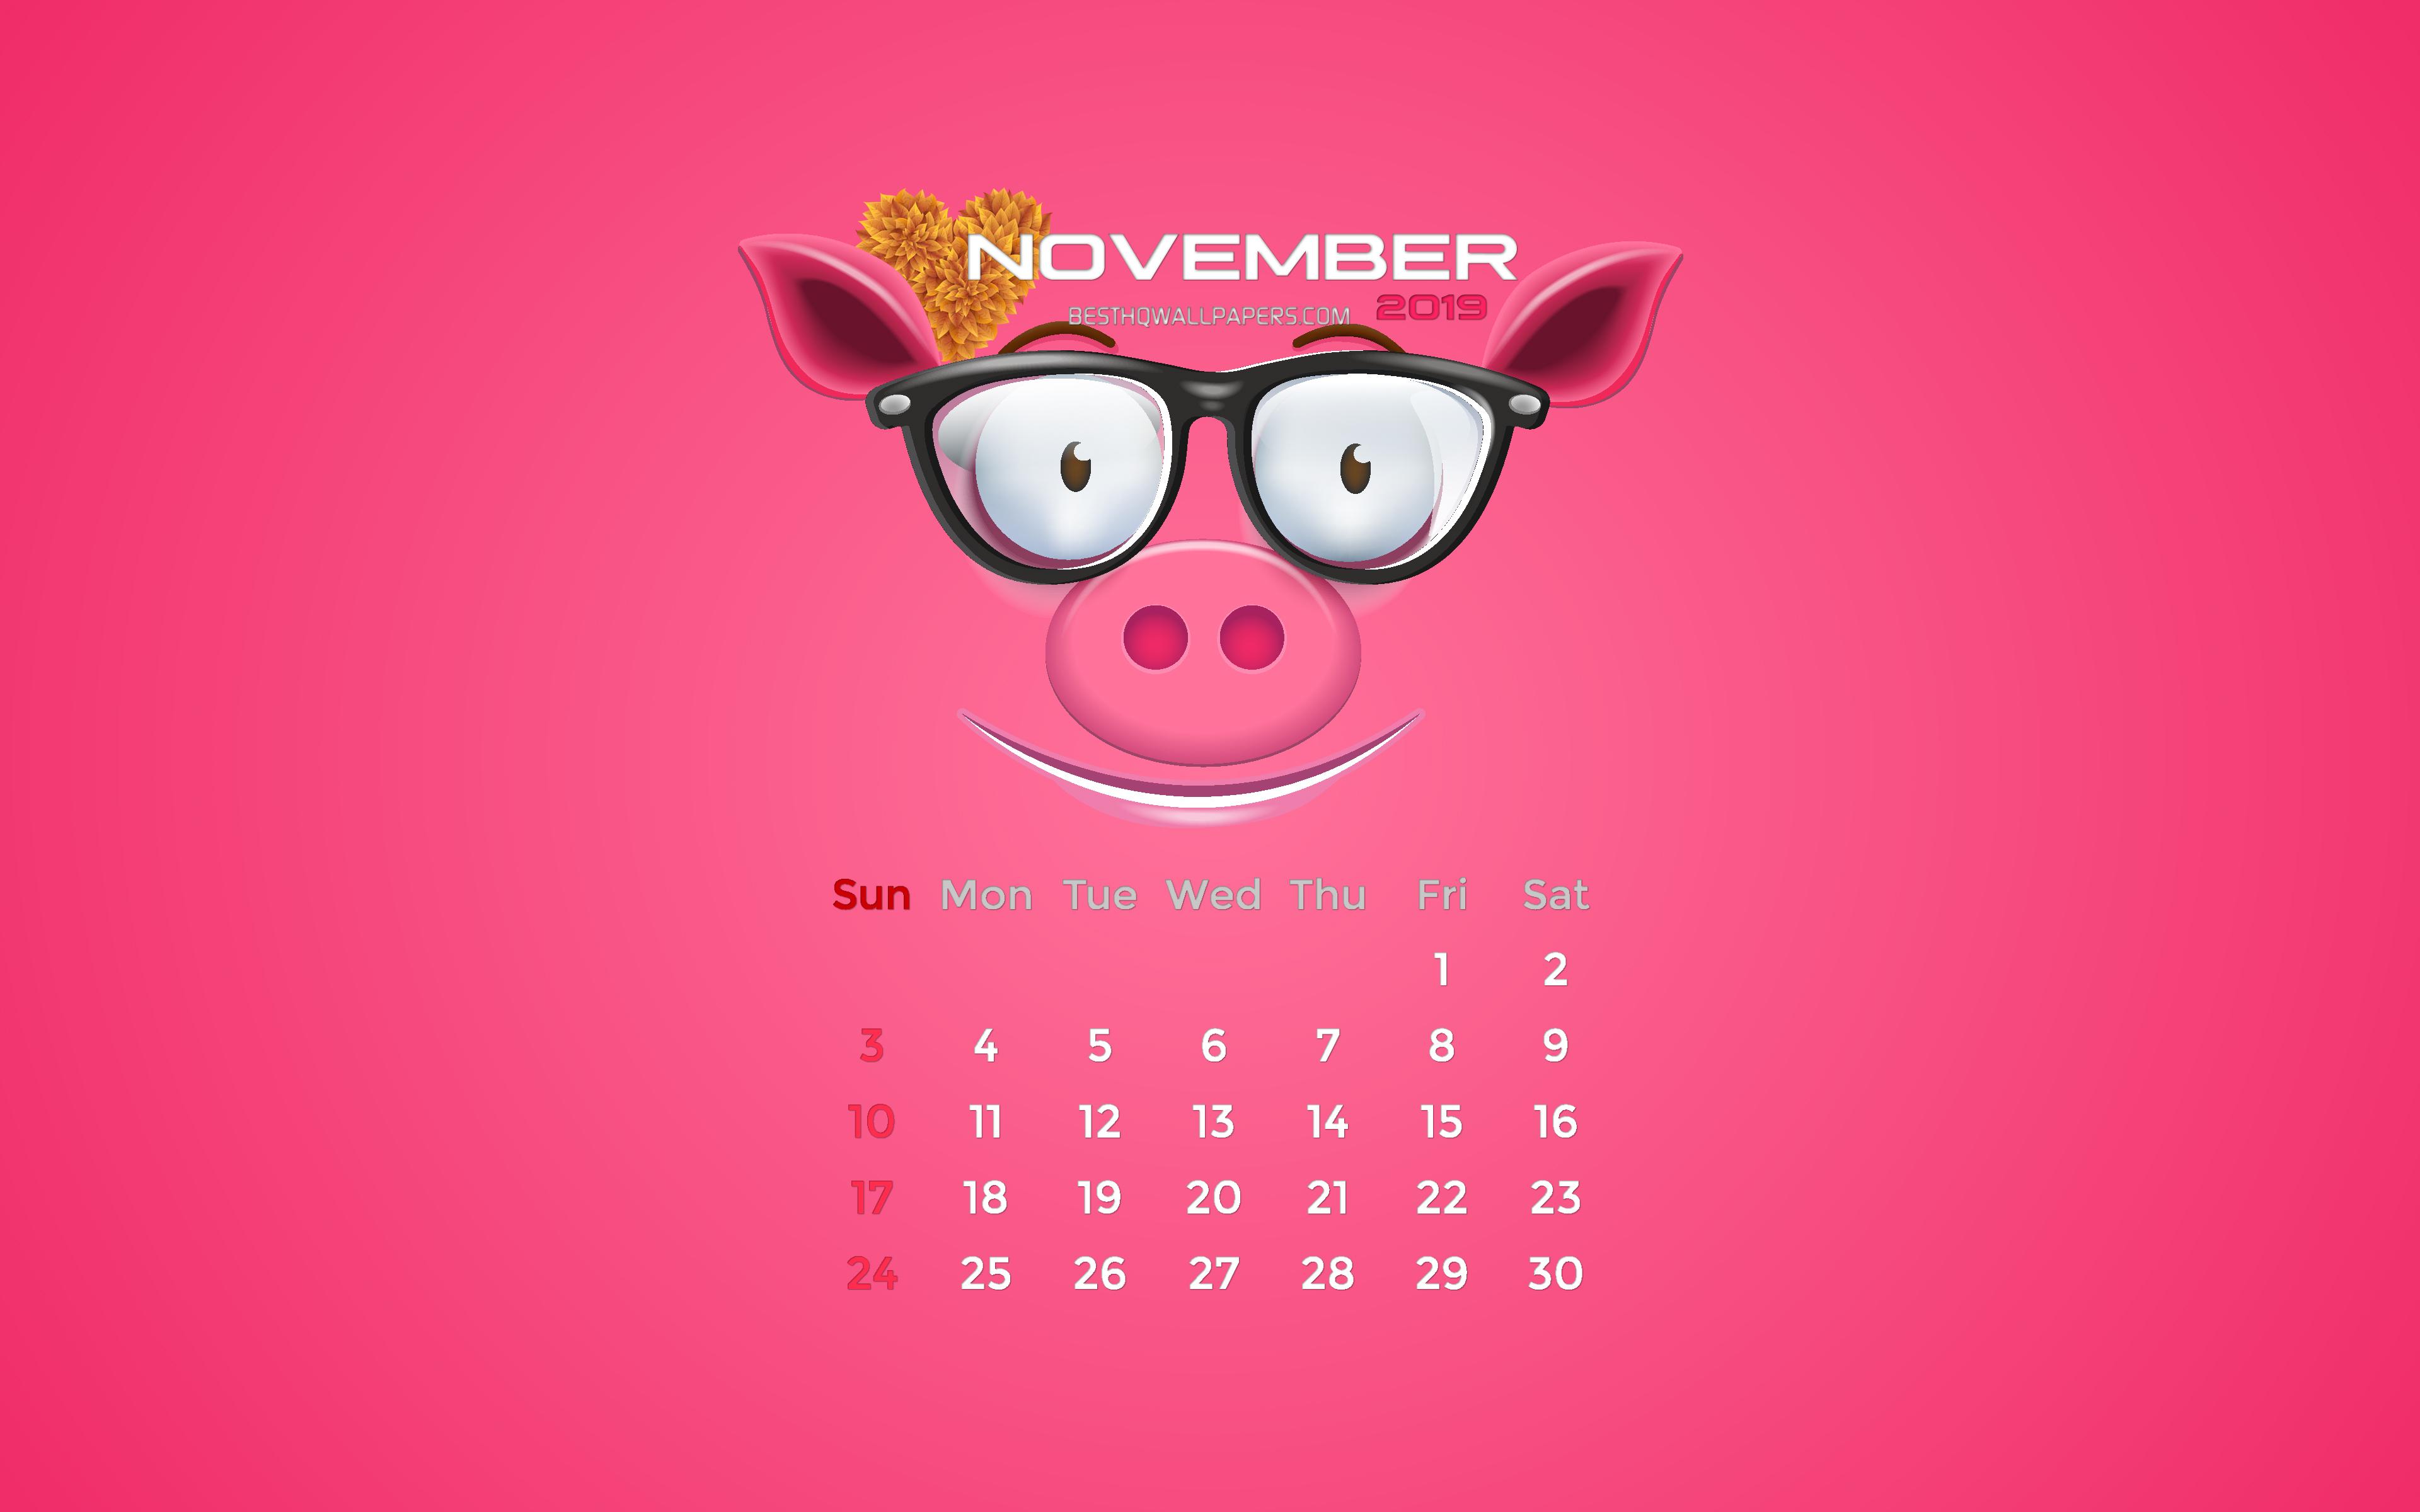 November Calendar 2019 Pink Design